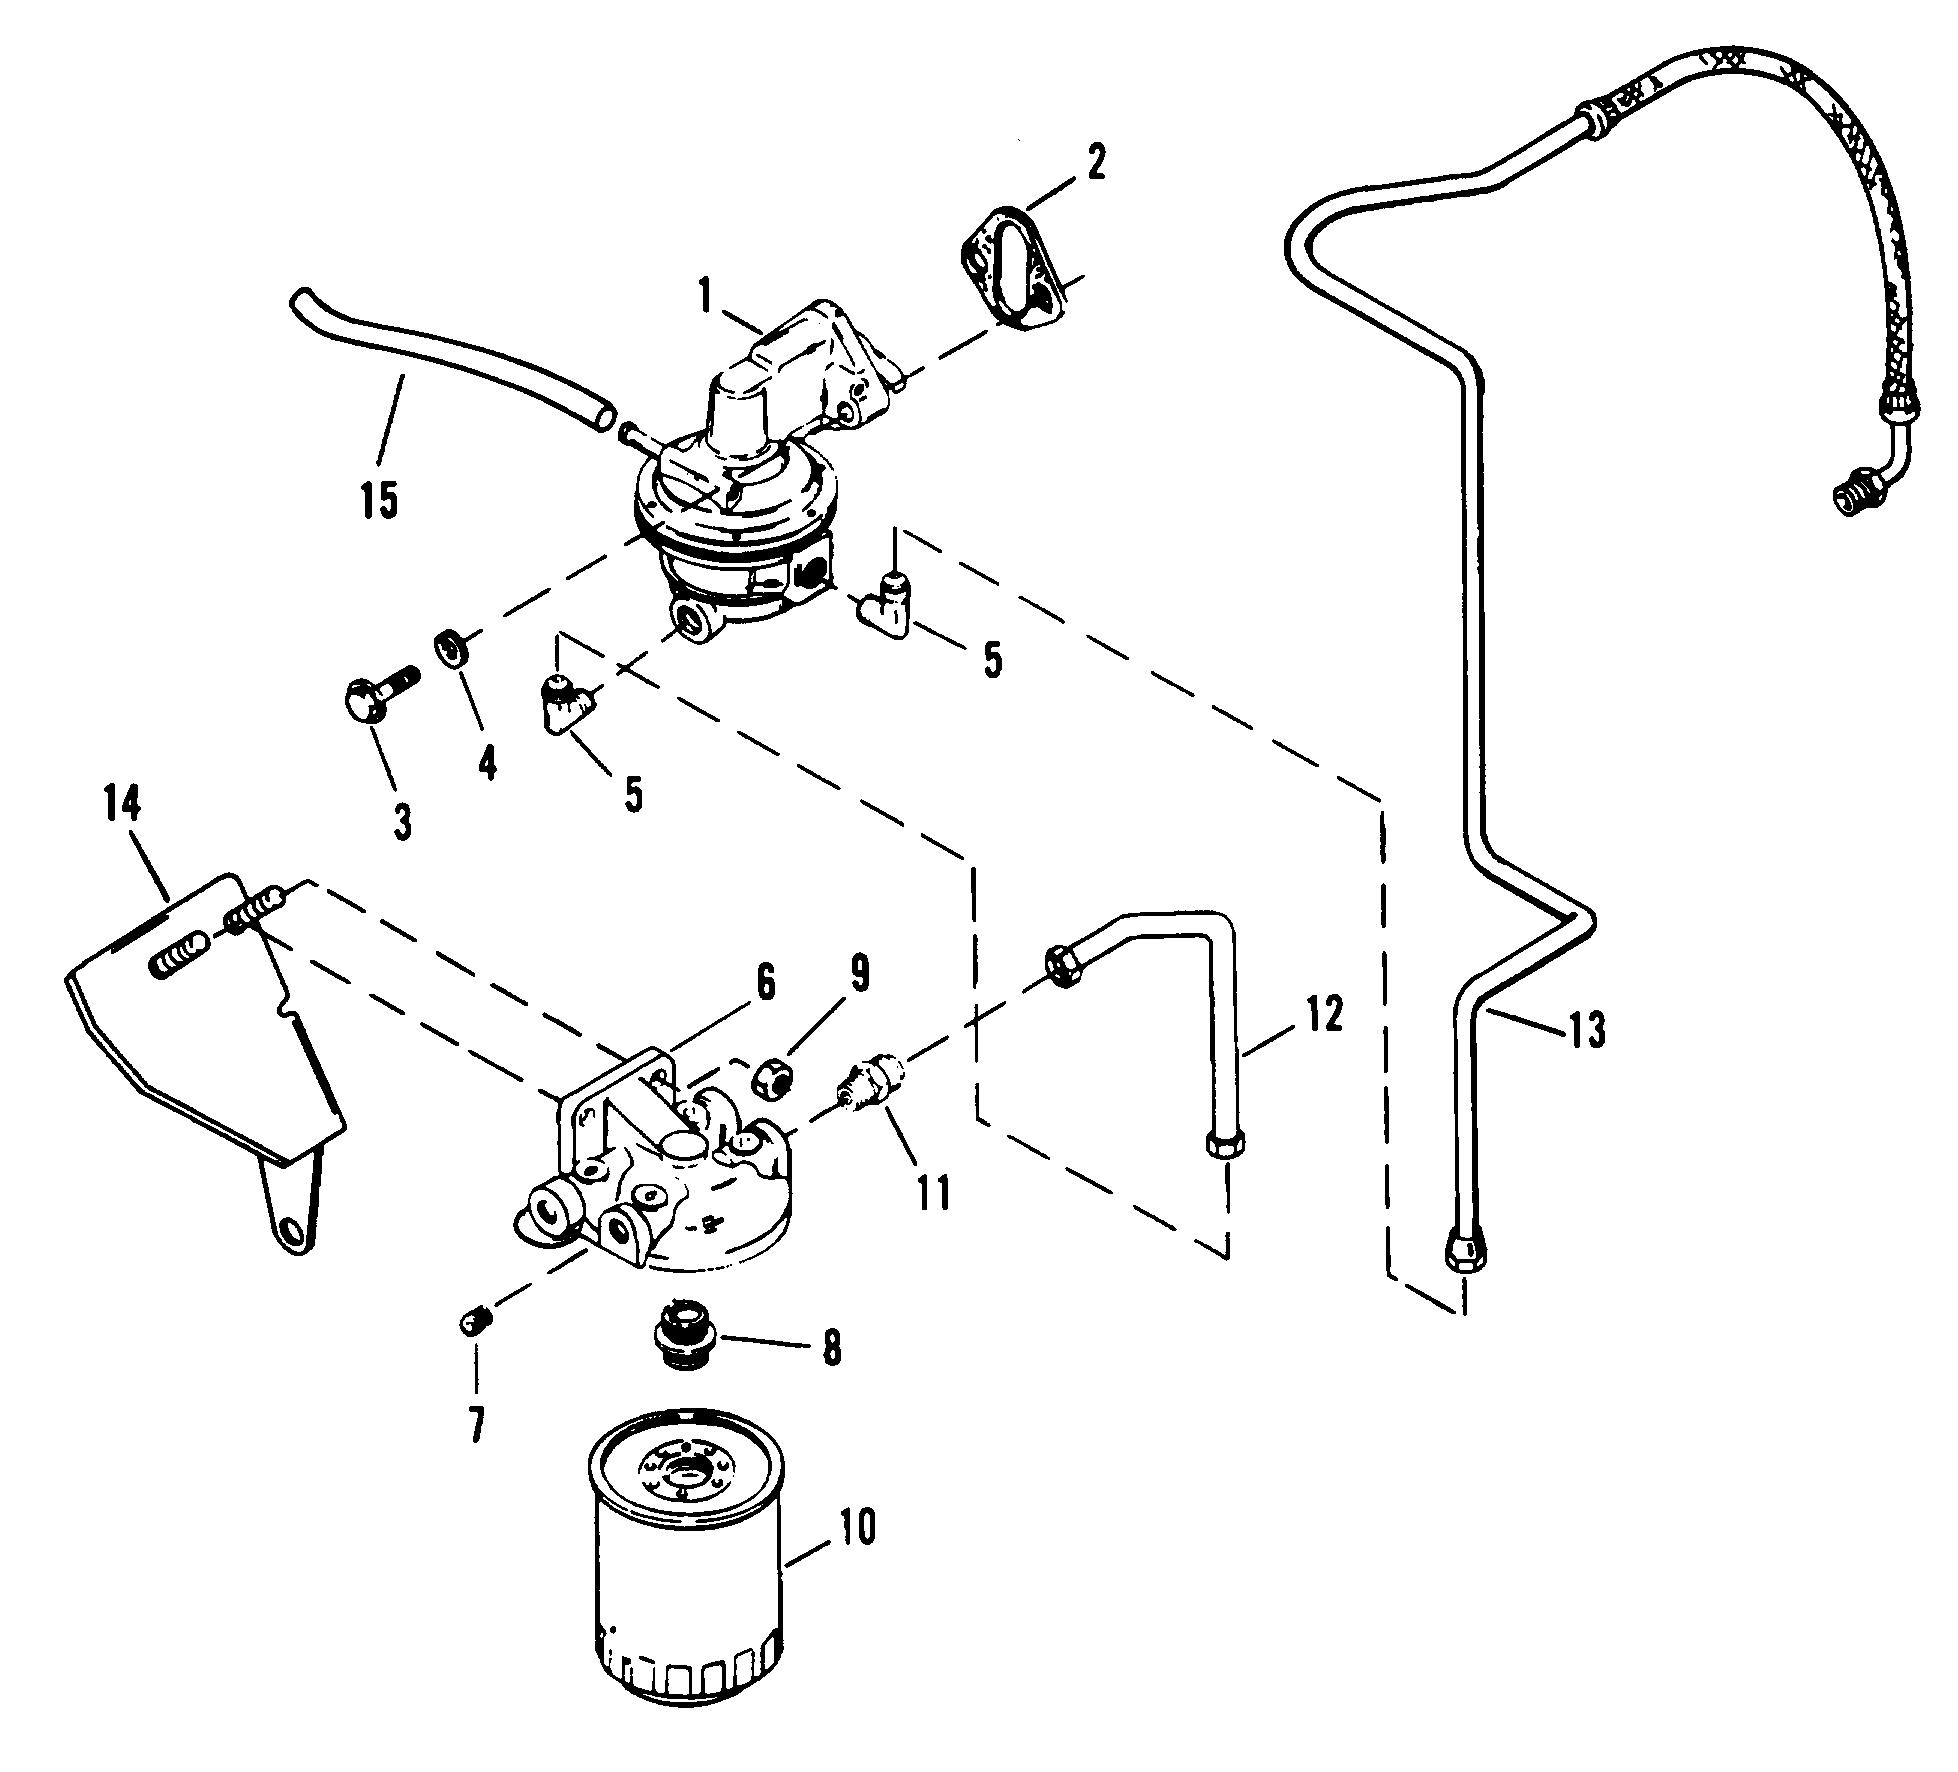 Mercruiser 454 Efi Ski Gen